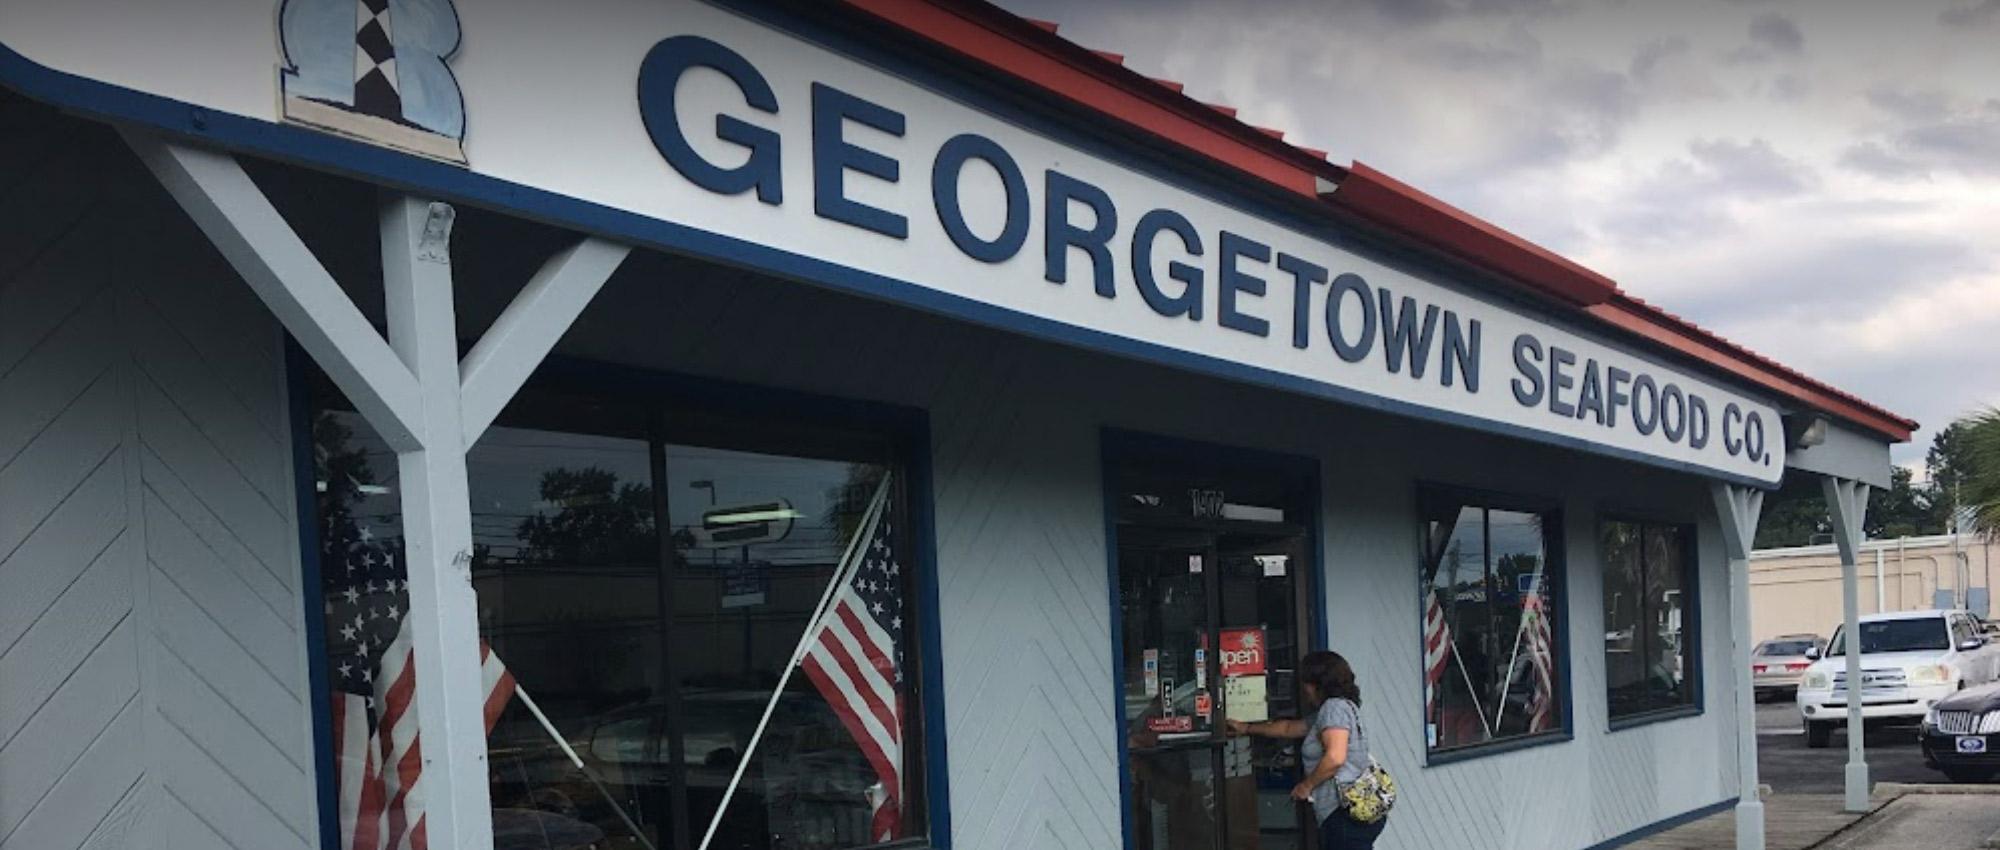 Georgetown Seafood Co.